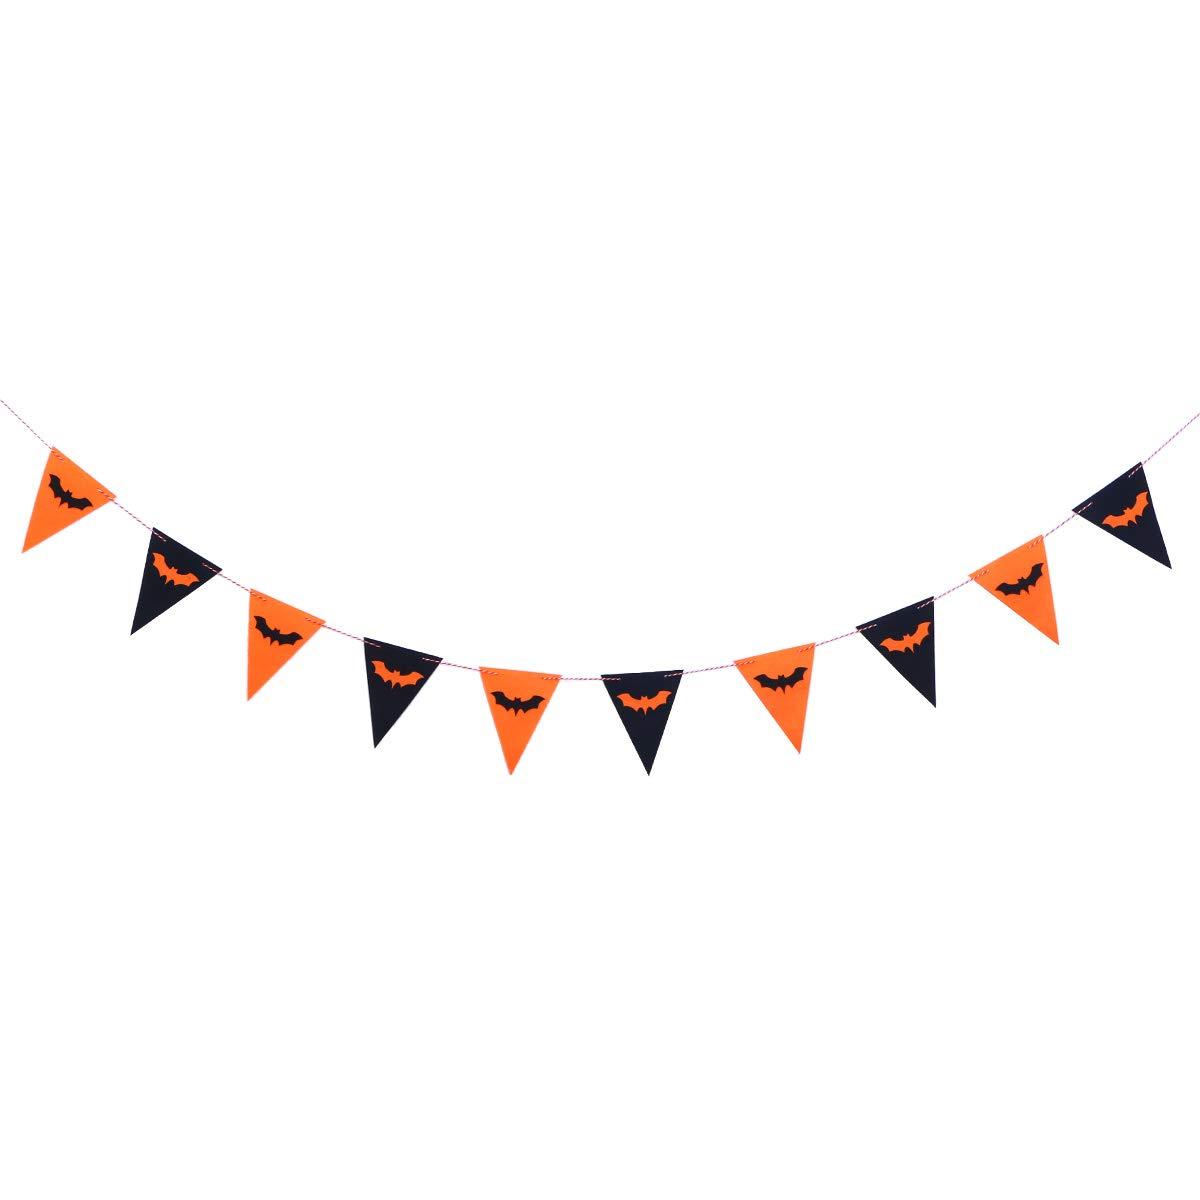 BESTOYARD ハロウィン フェルトクロス 旗 バンティング ガーランド 旗 バナー 屋内 屋外 装飾 フェスティバル パーティー   B07GYLCT7J